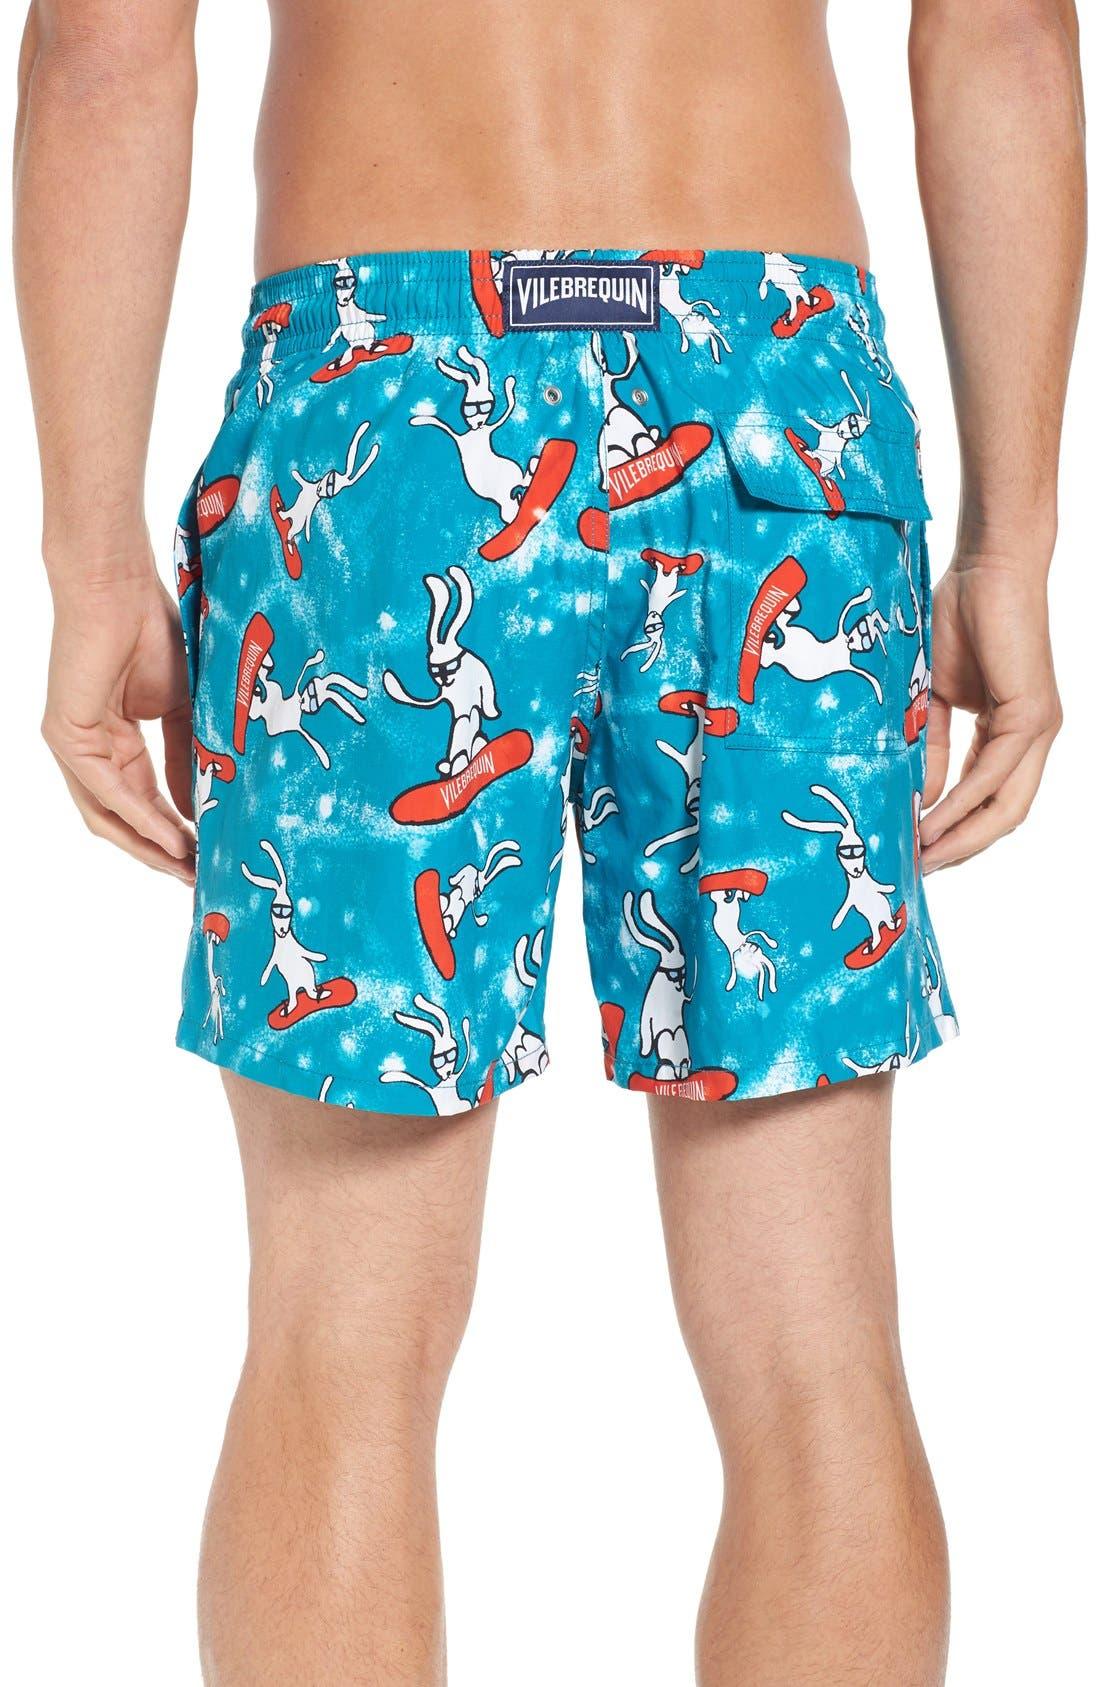 Alternate Image 2  - Vilebrequin Snowboard Bunnies Print Swim Trunks